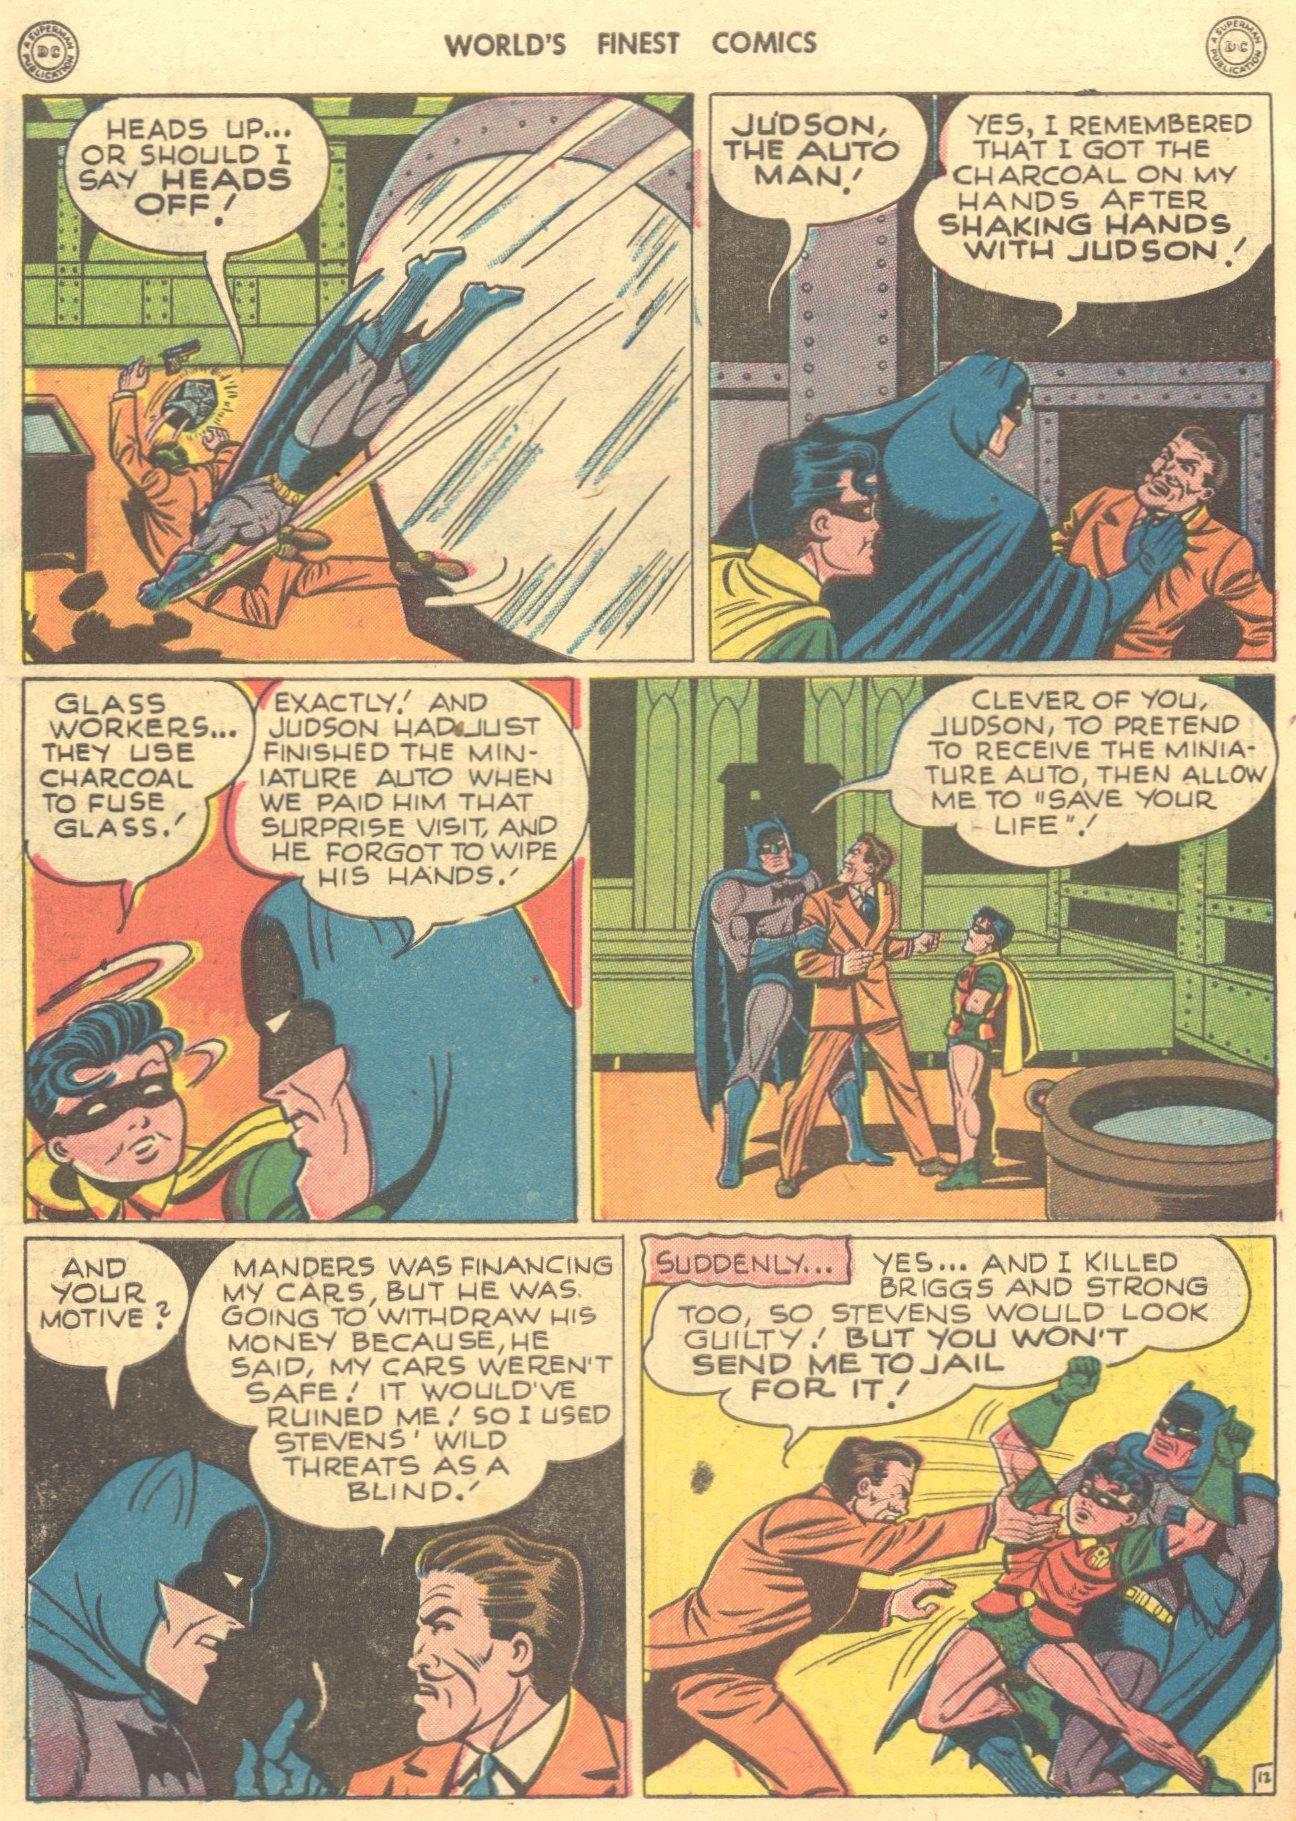 Read online World's Finest Comics comic -  Issue #28 - 71